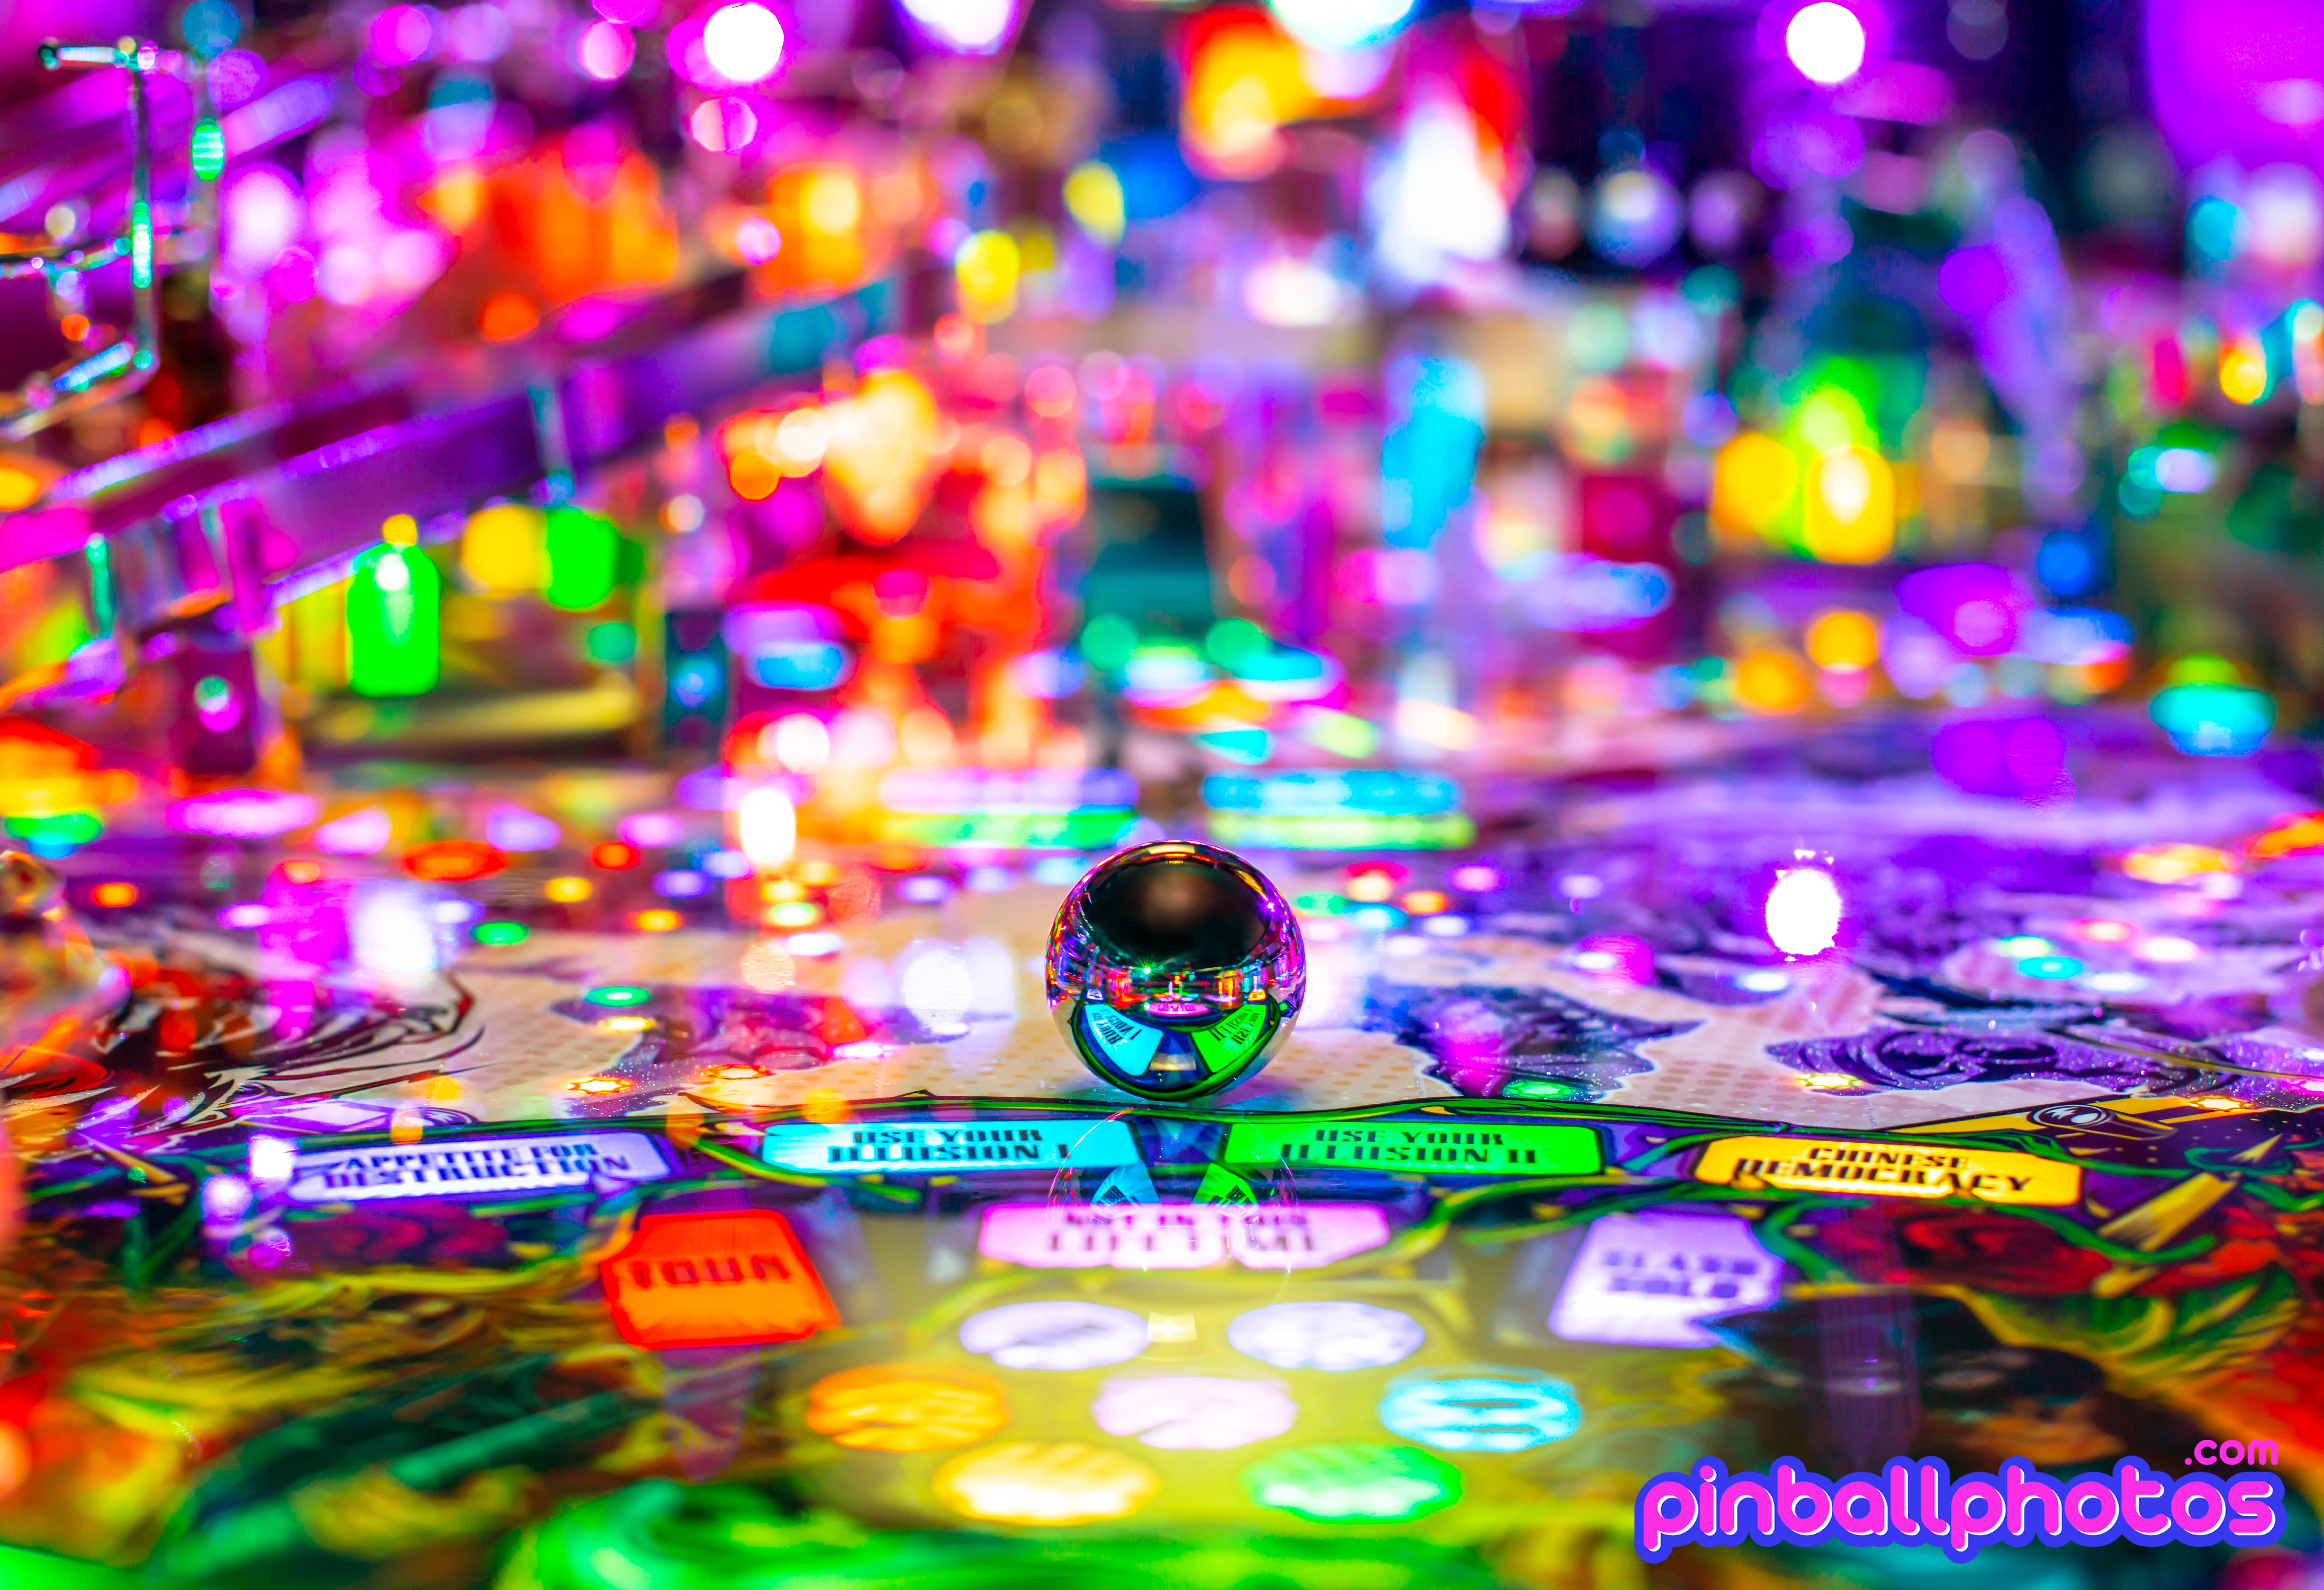 Pinball Photography